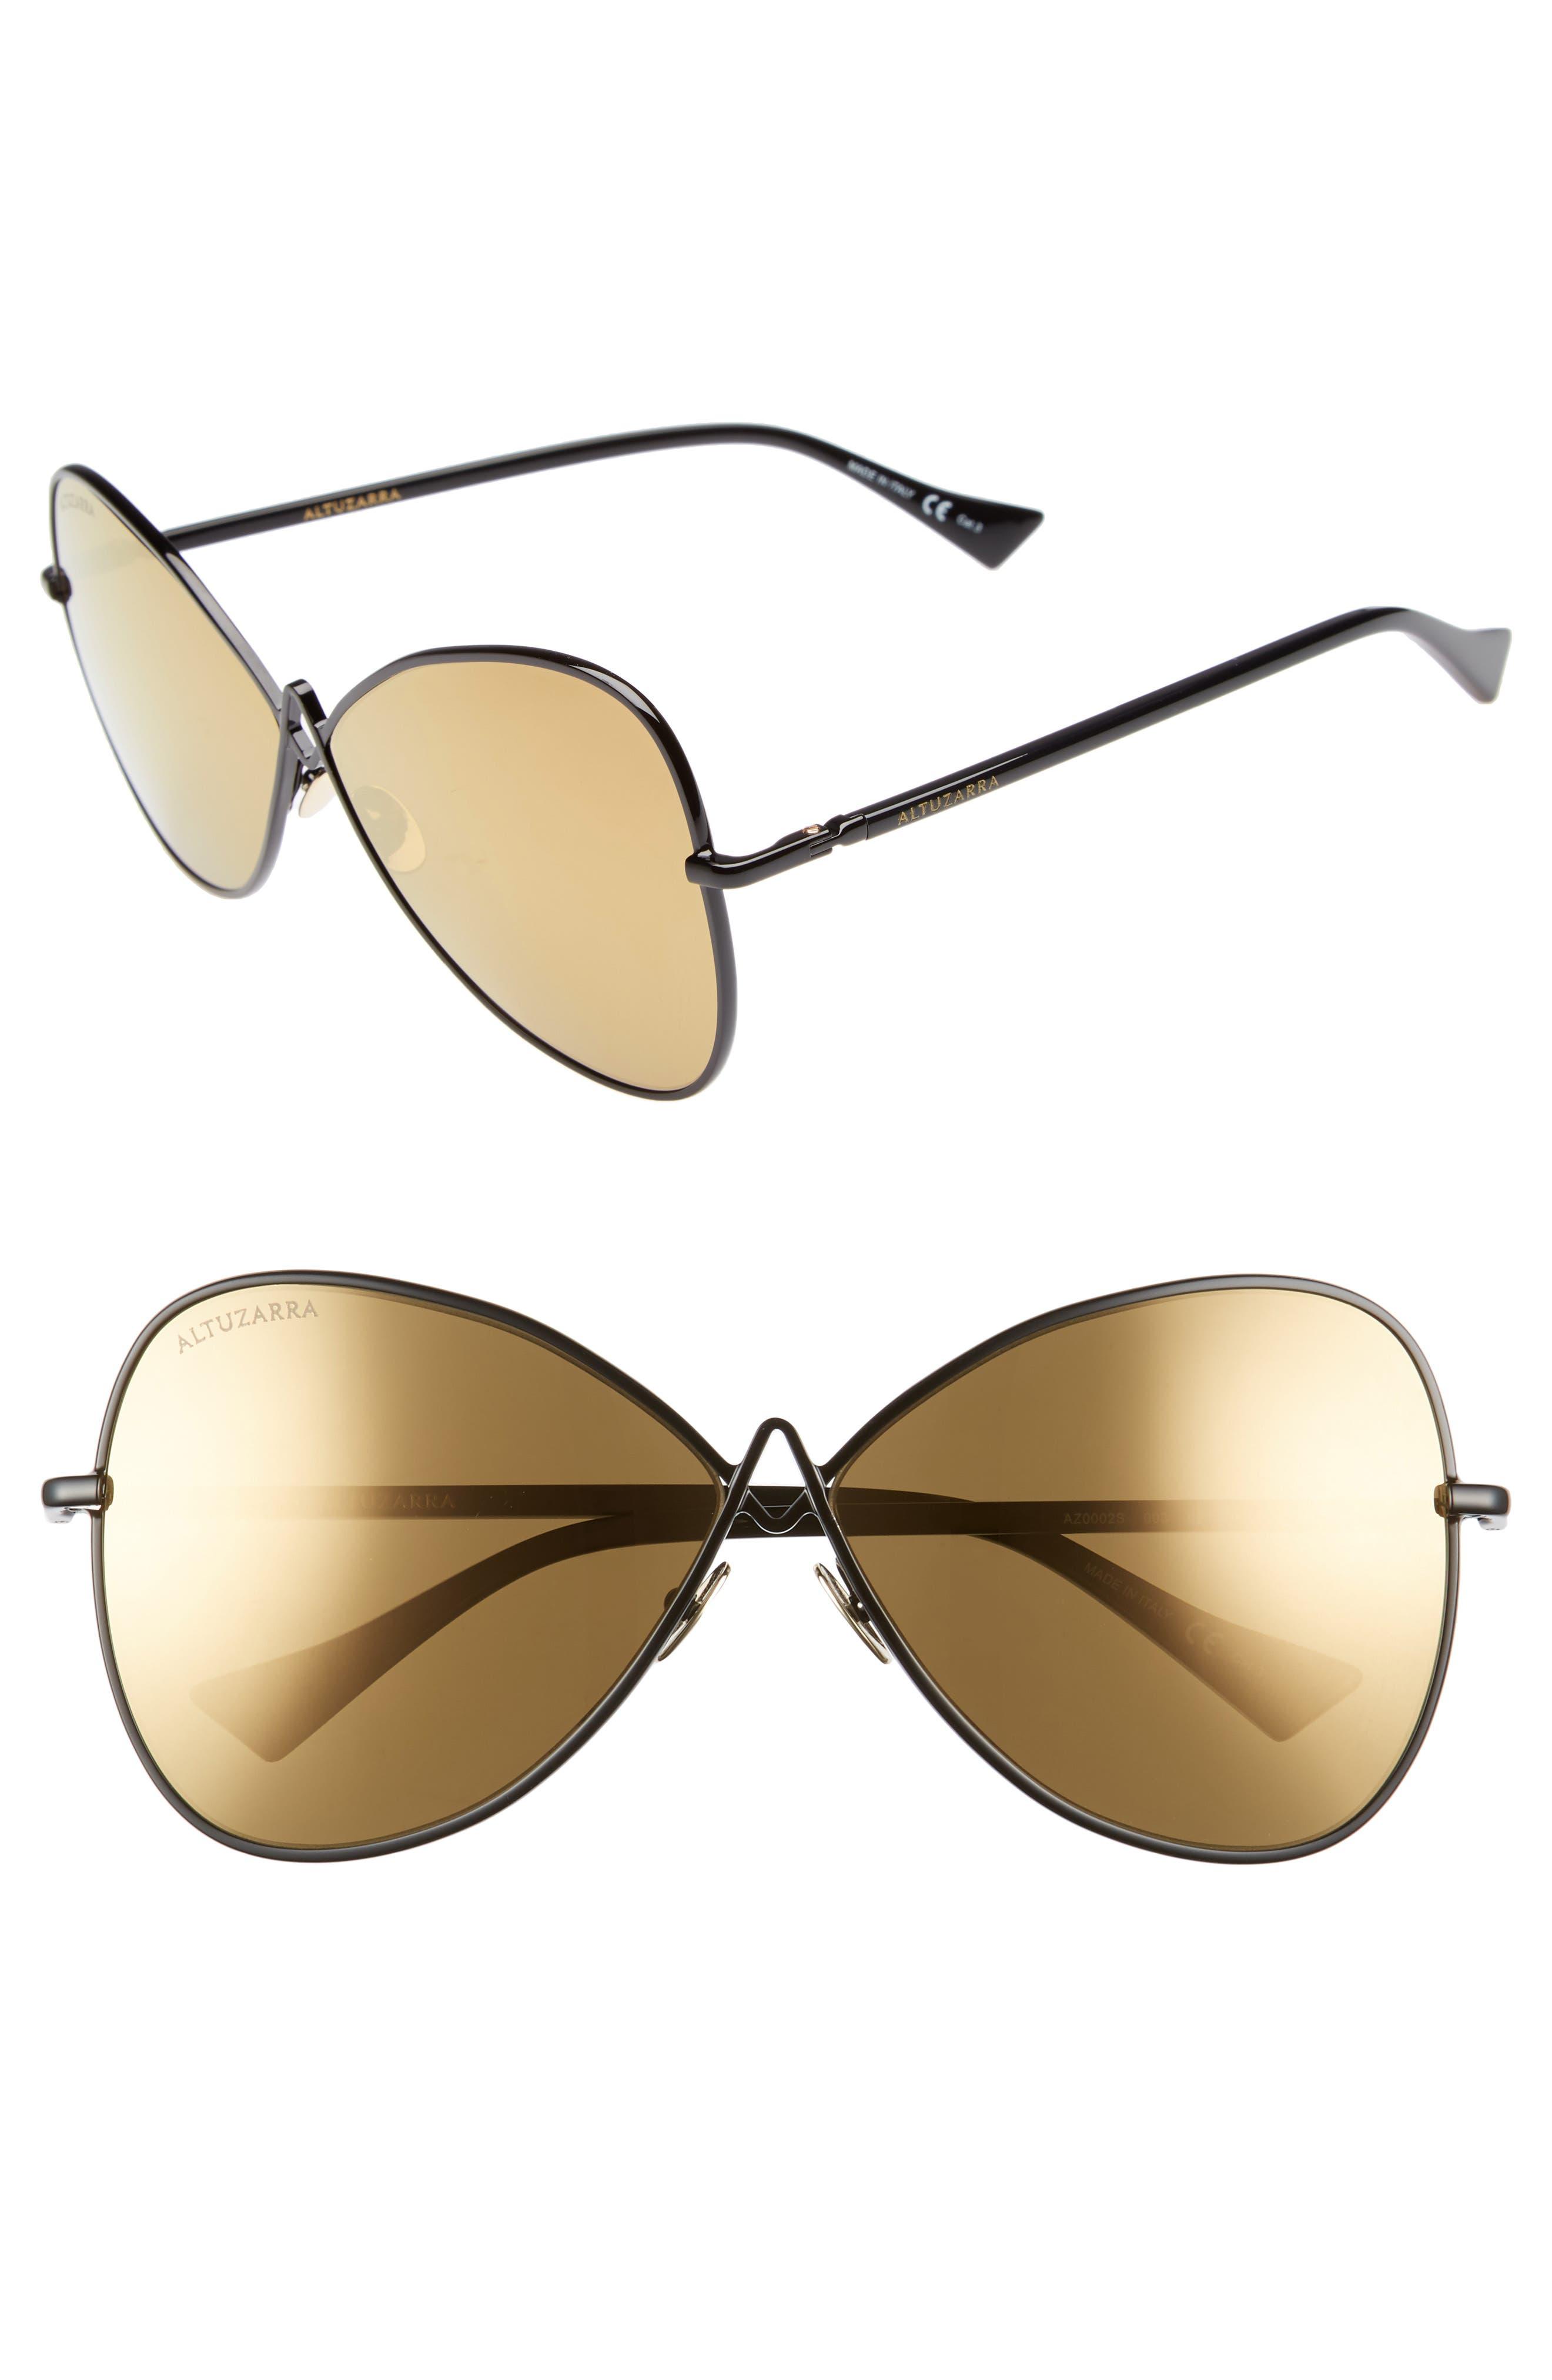 62mm Sunglasses,                             Main thumbnail 1, color,                             BLACK